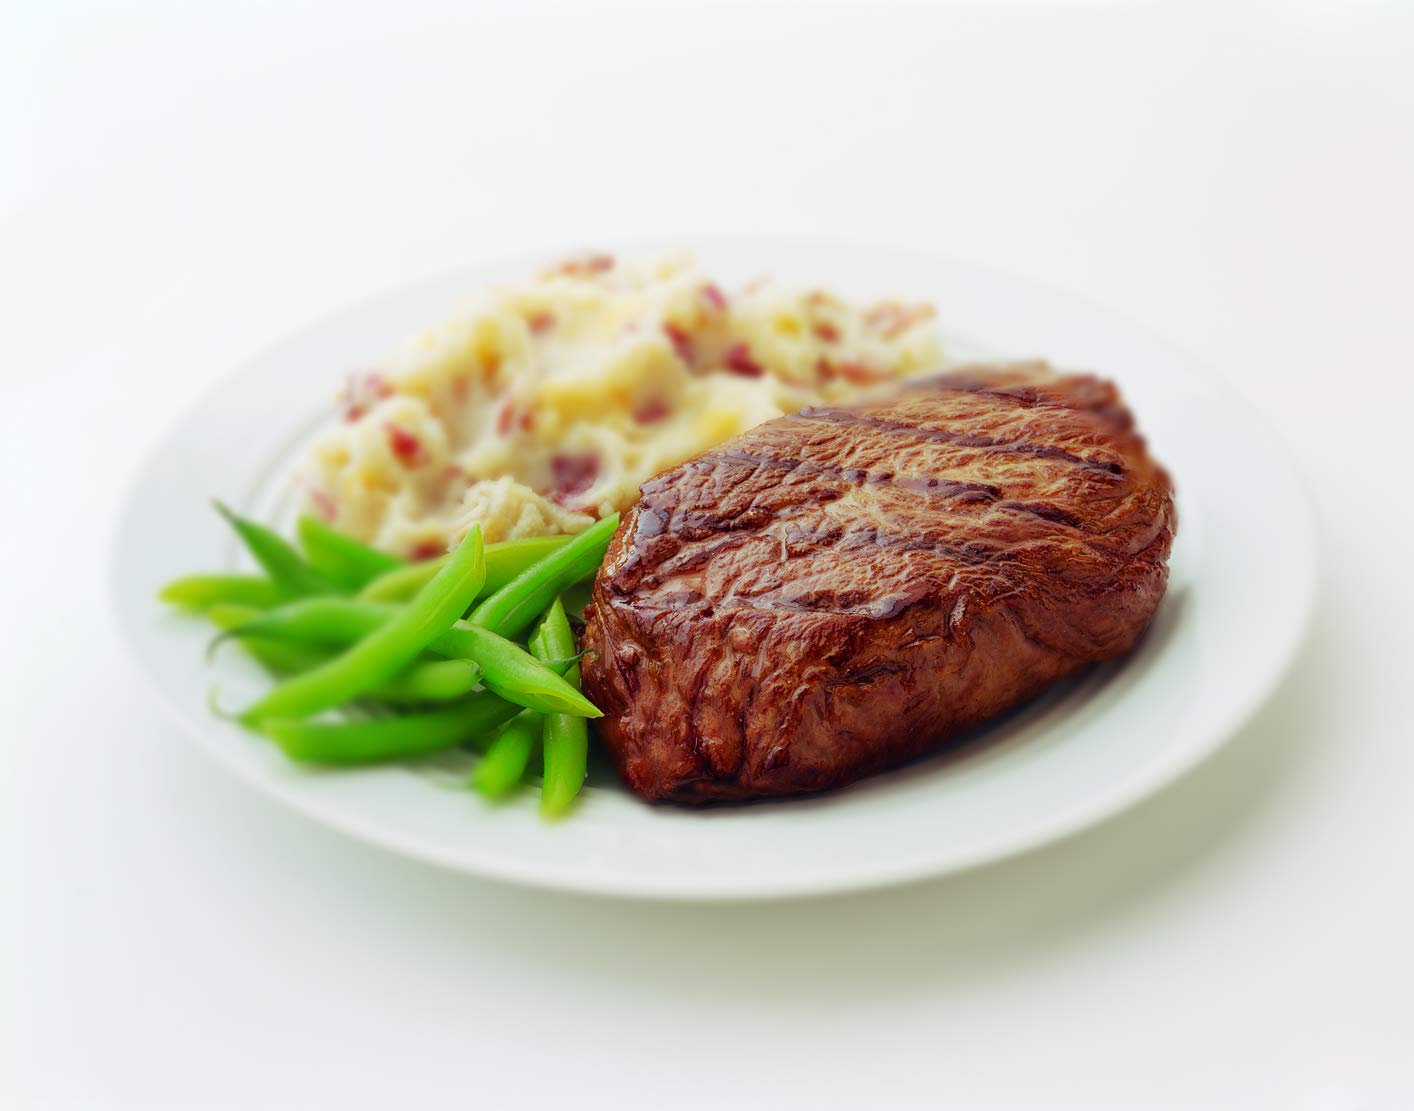 No Name Original Sirloin Steak Gift Package of Steaks | Family Pack of 8 6oz Steaks